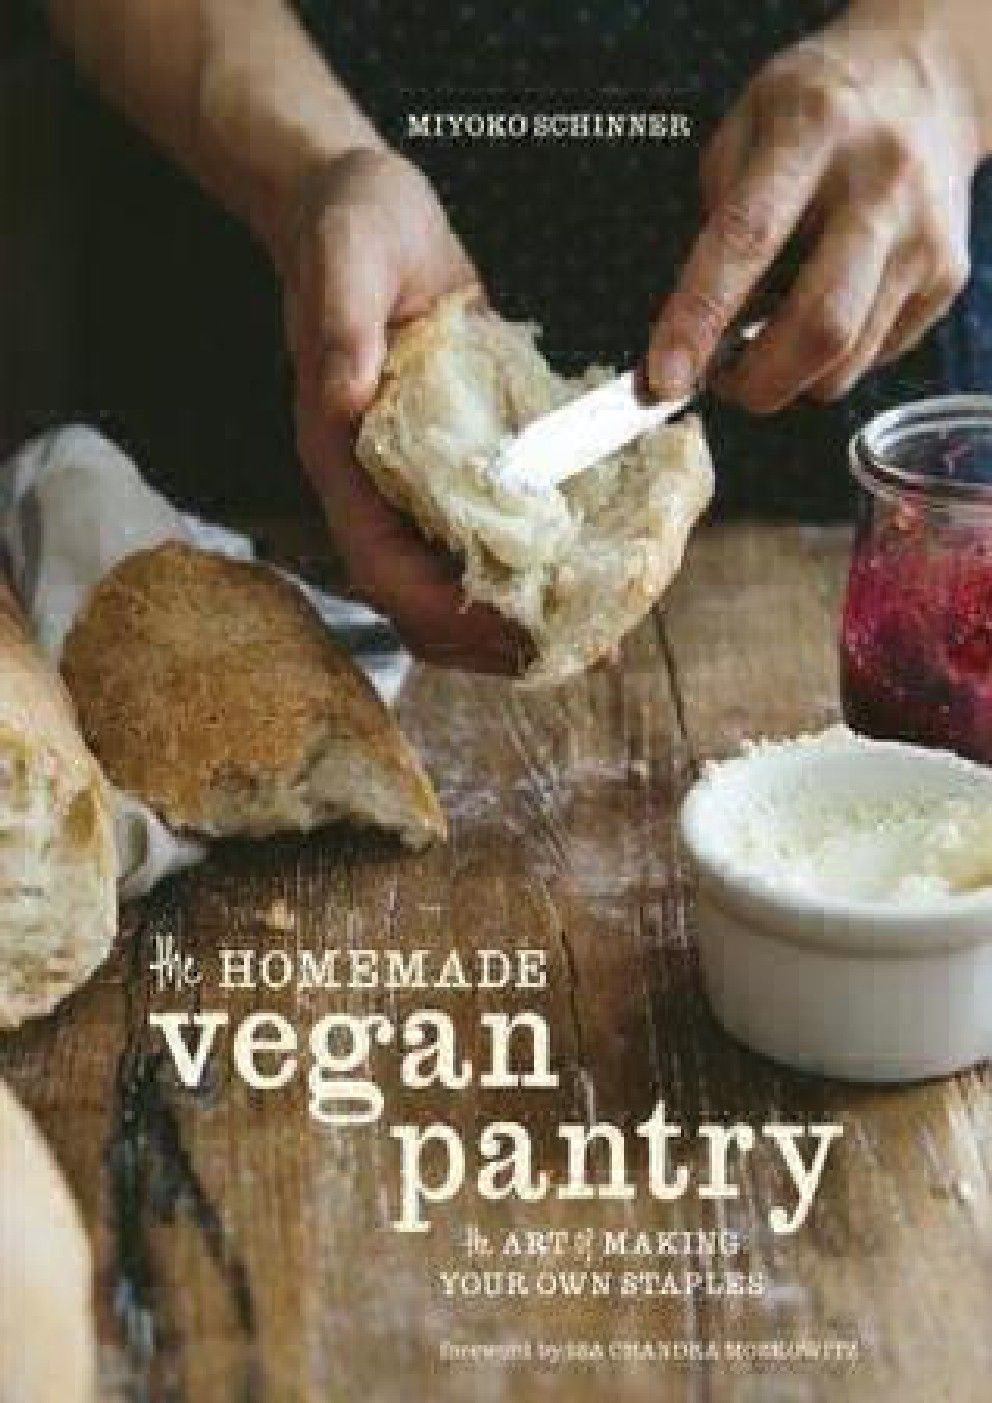 Pdf Download The Homemade Vegan Pantry The Art Of Making Your Own Staples By Miyoko Nishimoto Vegan Pantry Vegan Cookbook Whole Food Recipes